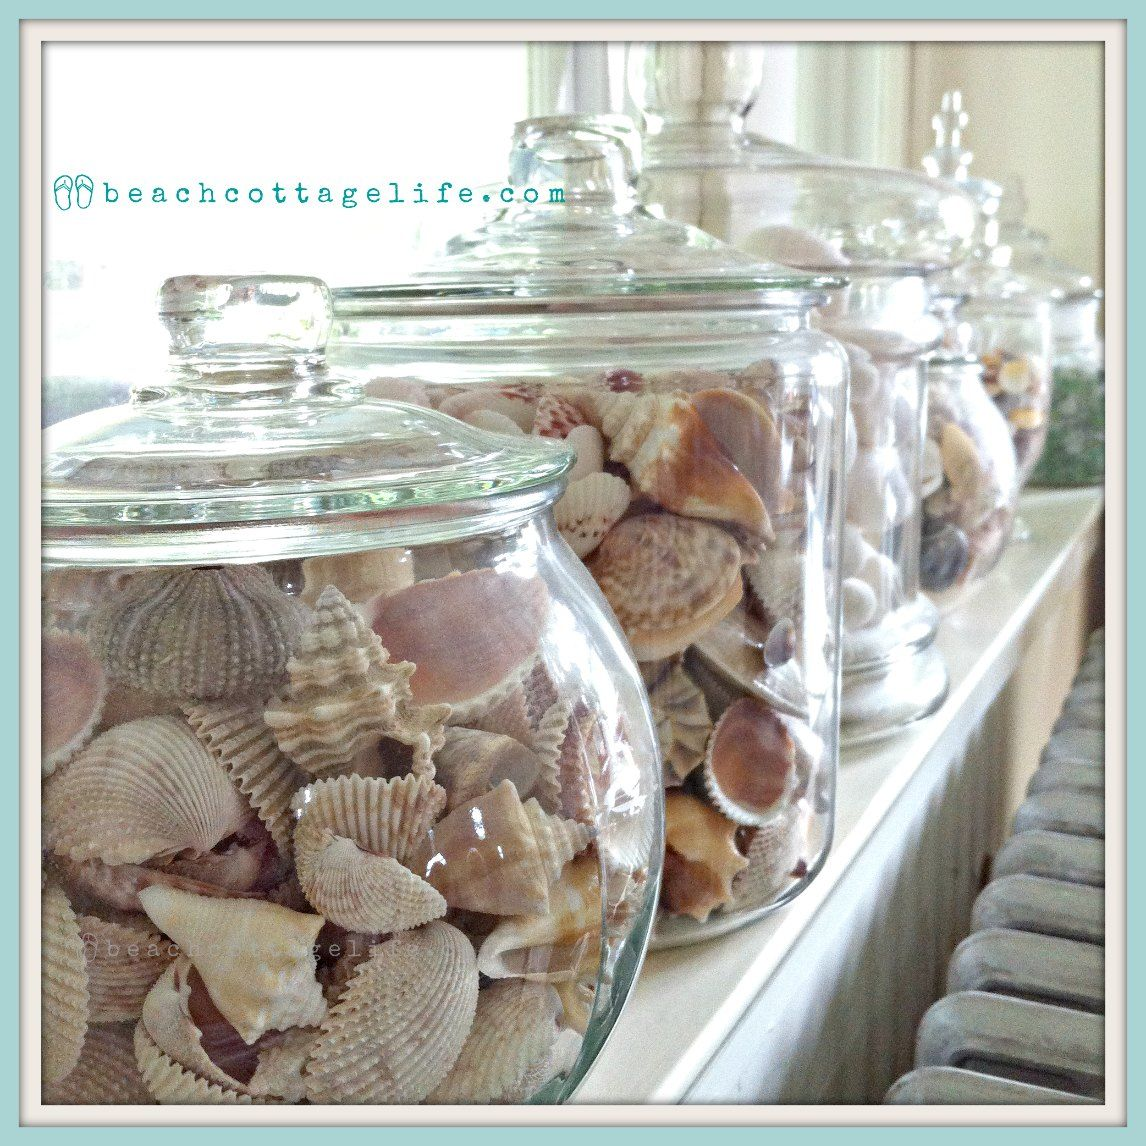 Home Decor Beach: Coastal Home Decor. Shells, Sea Urchins, Sea Glass